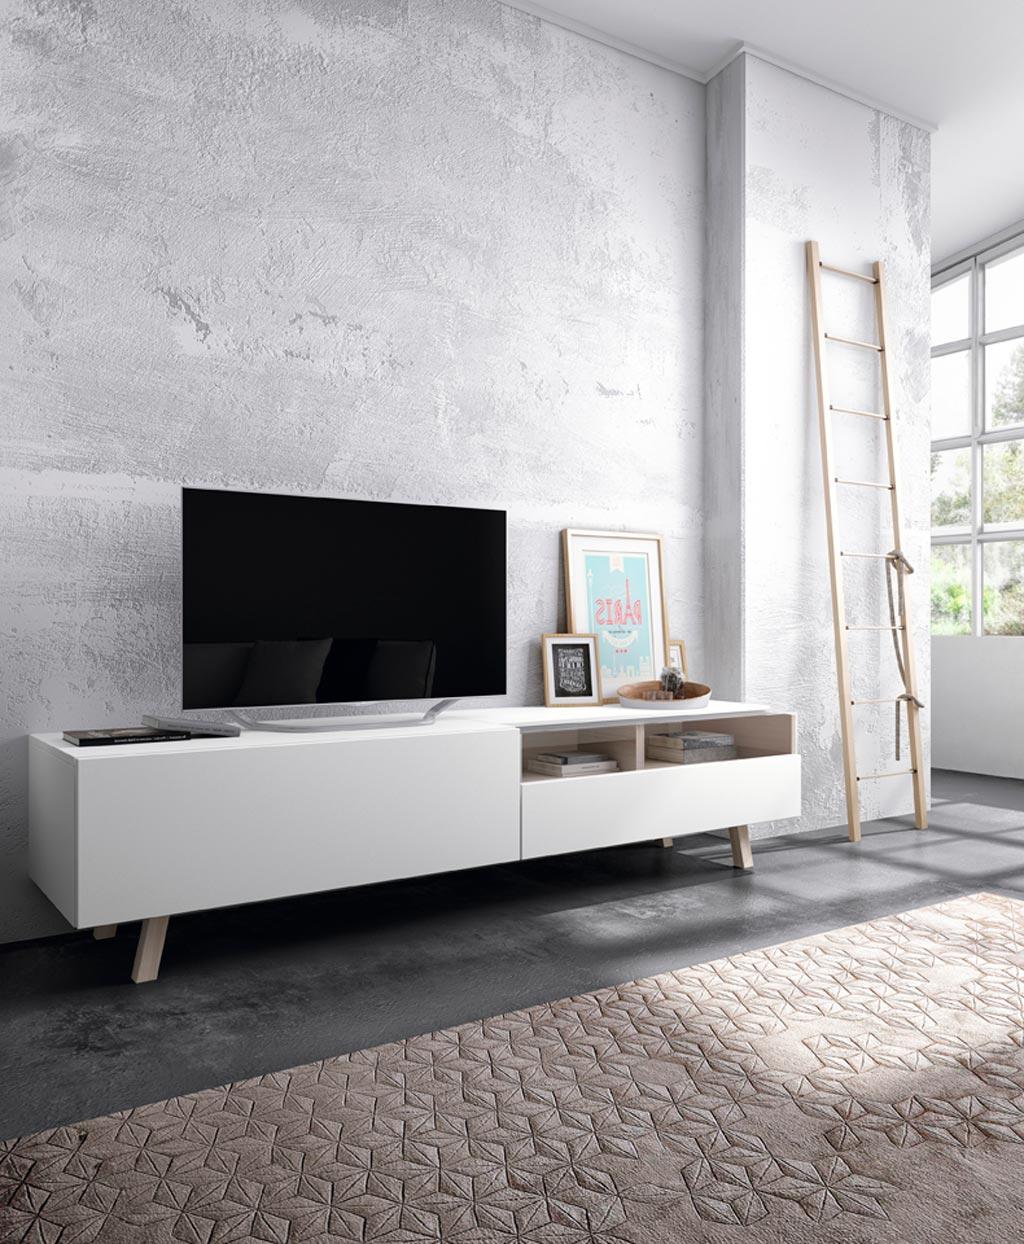 Muebles Salon Estilo nordico Zwdg Fotografà as De Salà Nes Y Edores Modernos Decormobel